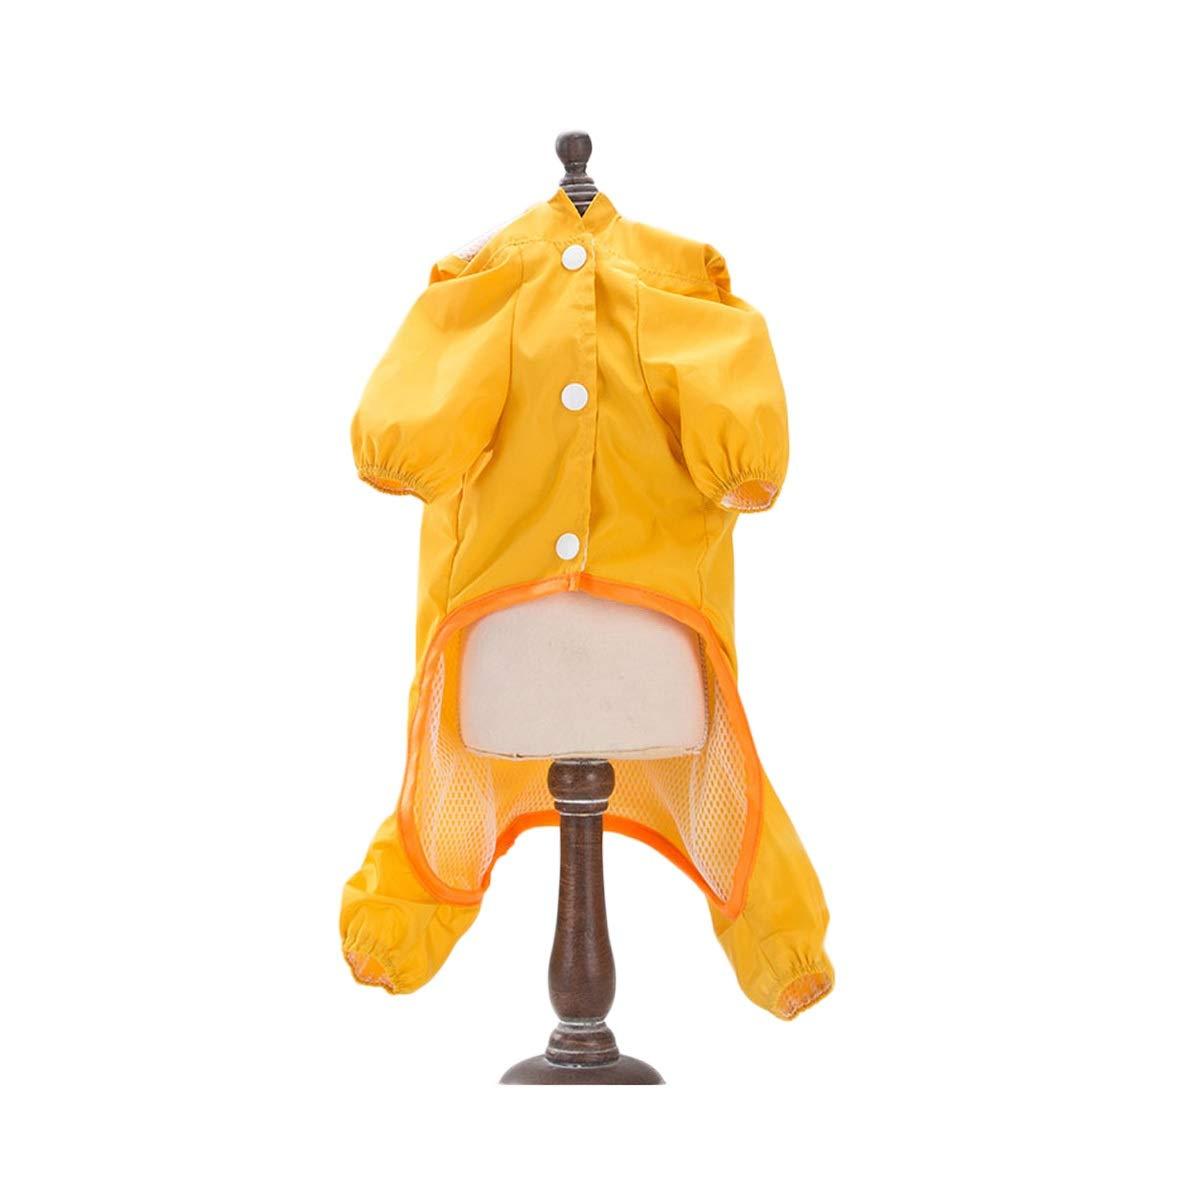 Duckling S Duckling S Xihouxian Dog Raincoat Dog Clothes Small Dog Medium Dog Waterproof Cute Dinosaur Duckling S M L XL XXL Raincoat (color   Duckling, Size   S)